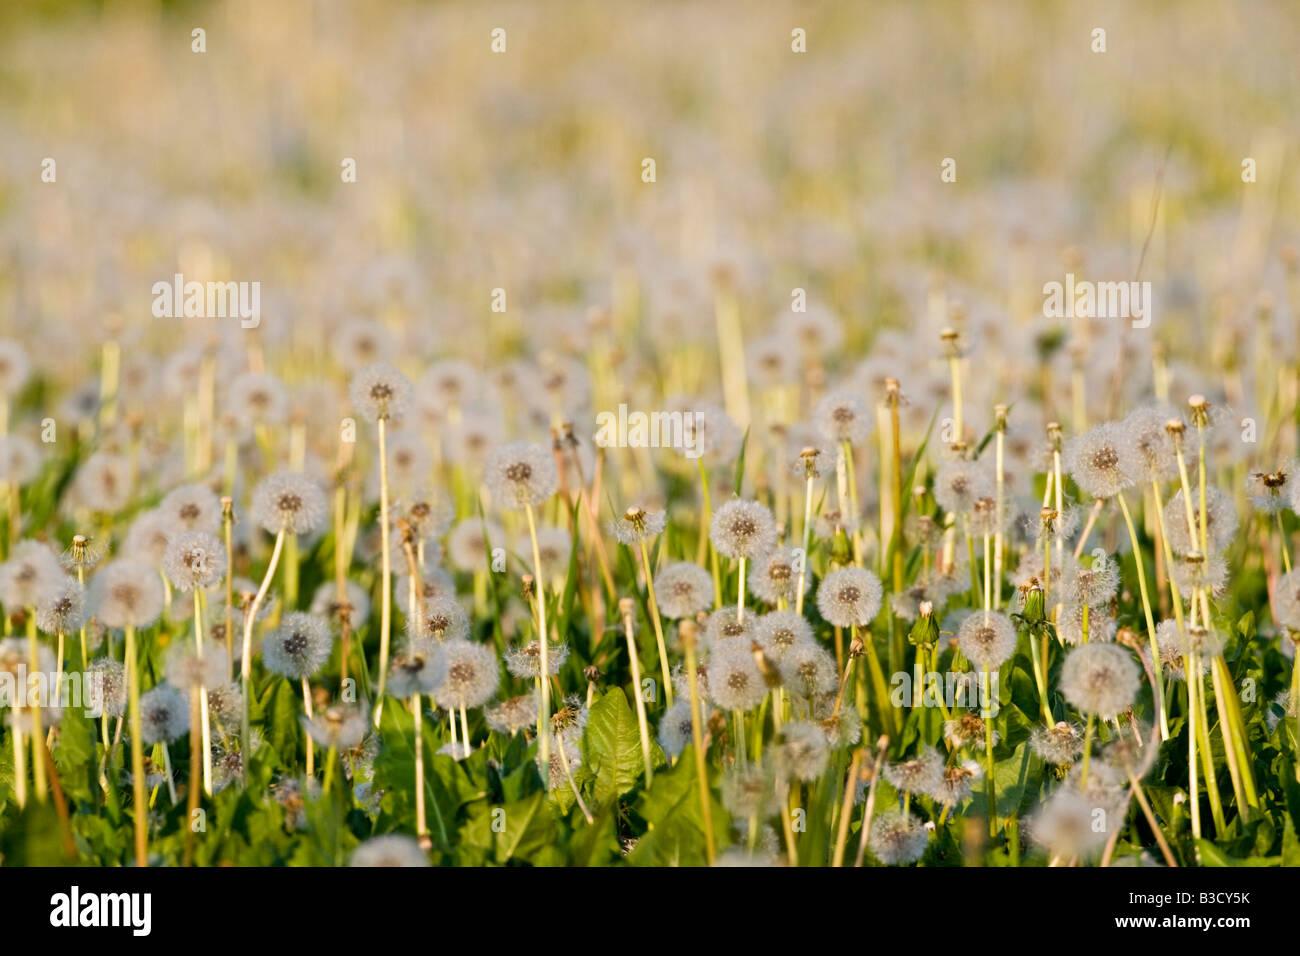 Germany, Bavaria, Dandelion clocks - Stock Image